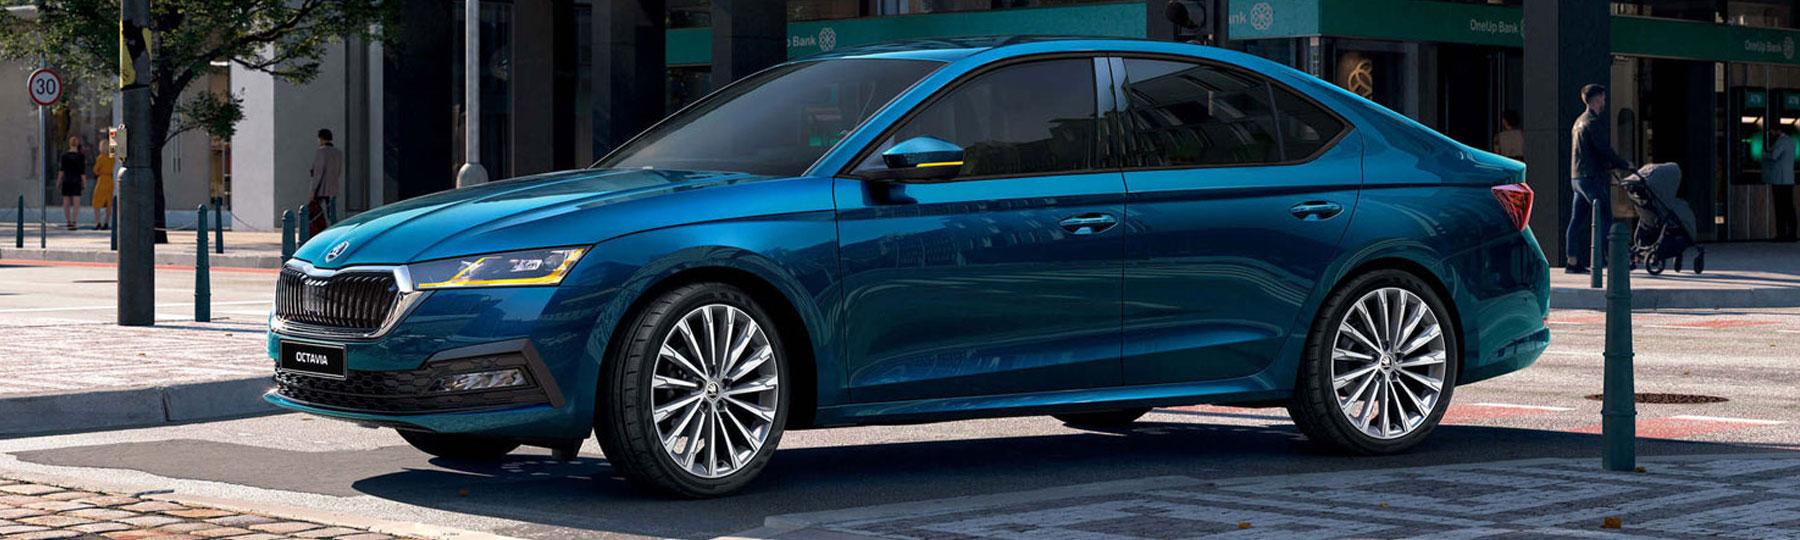 New ŠKODA OCTAVIA Hatch New Car Offer